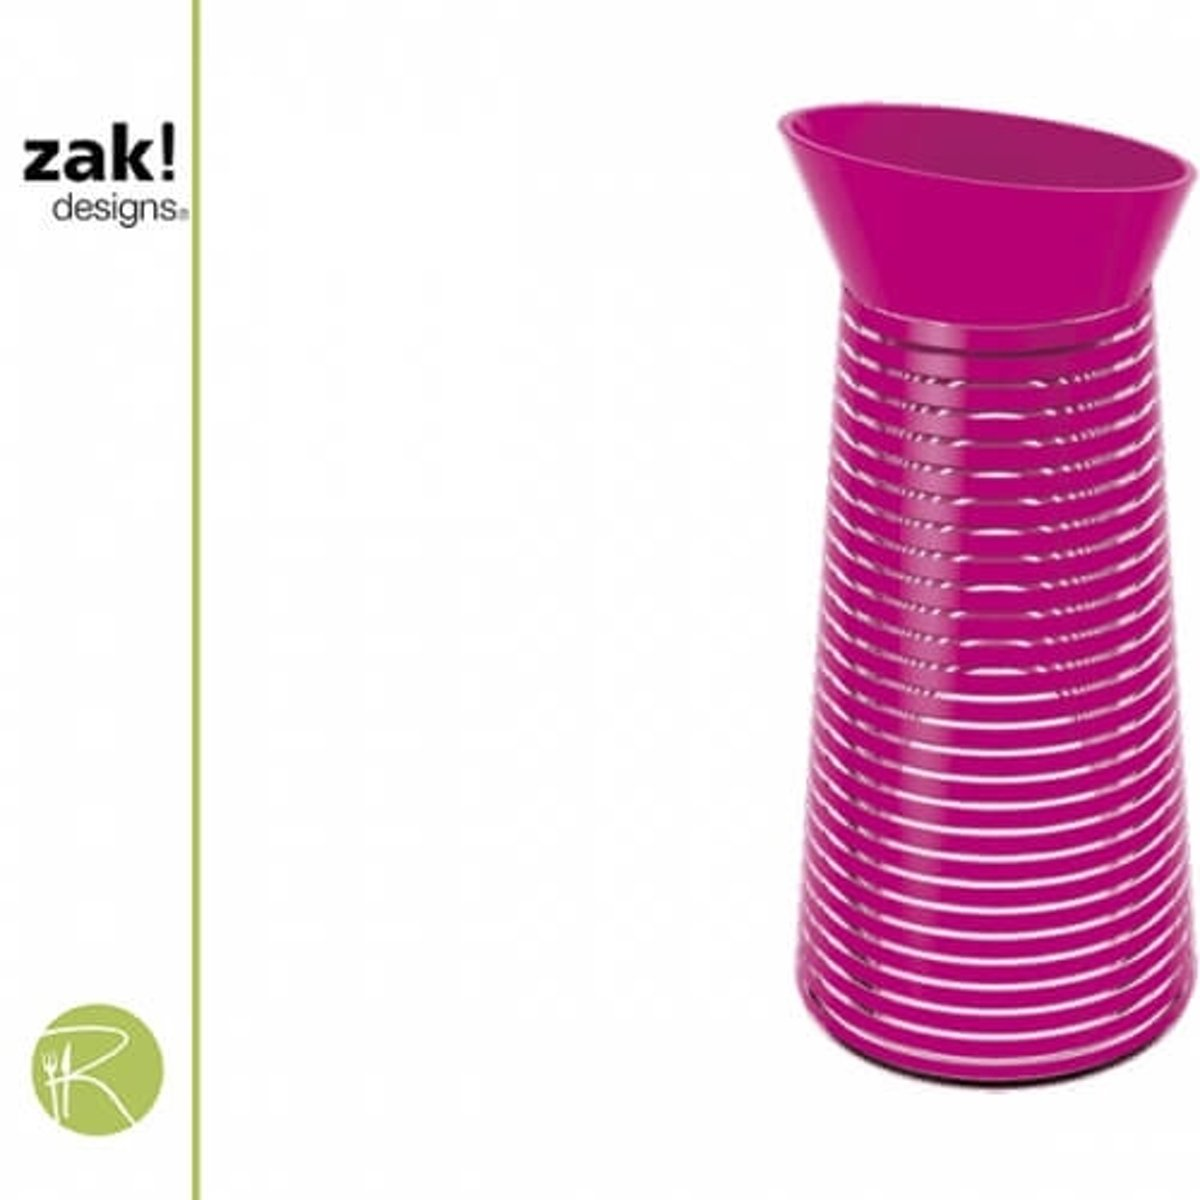 Zak!Designs Swirl - Waterkaraf - 1 liter - Fuchsia